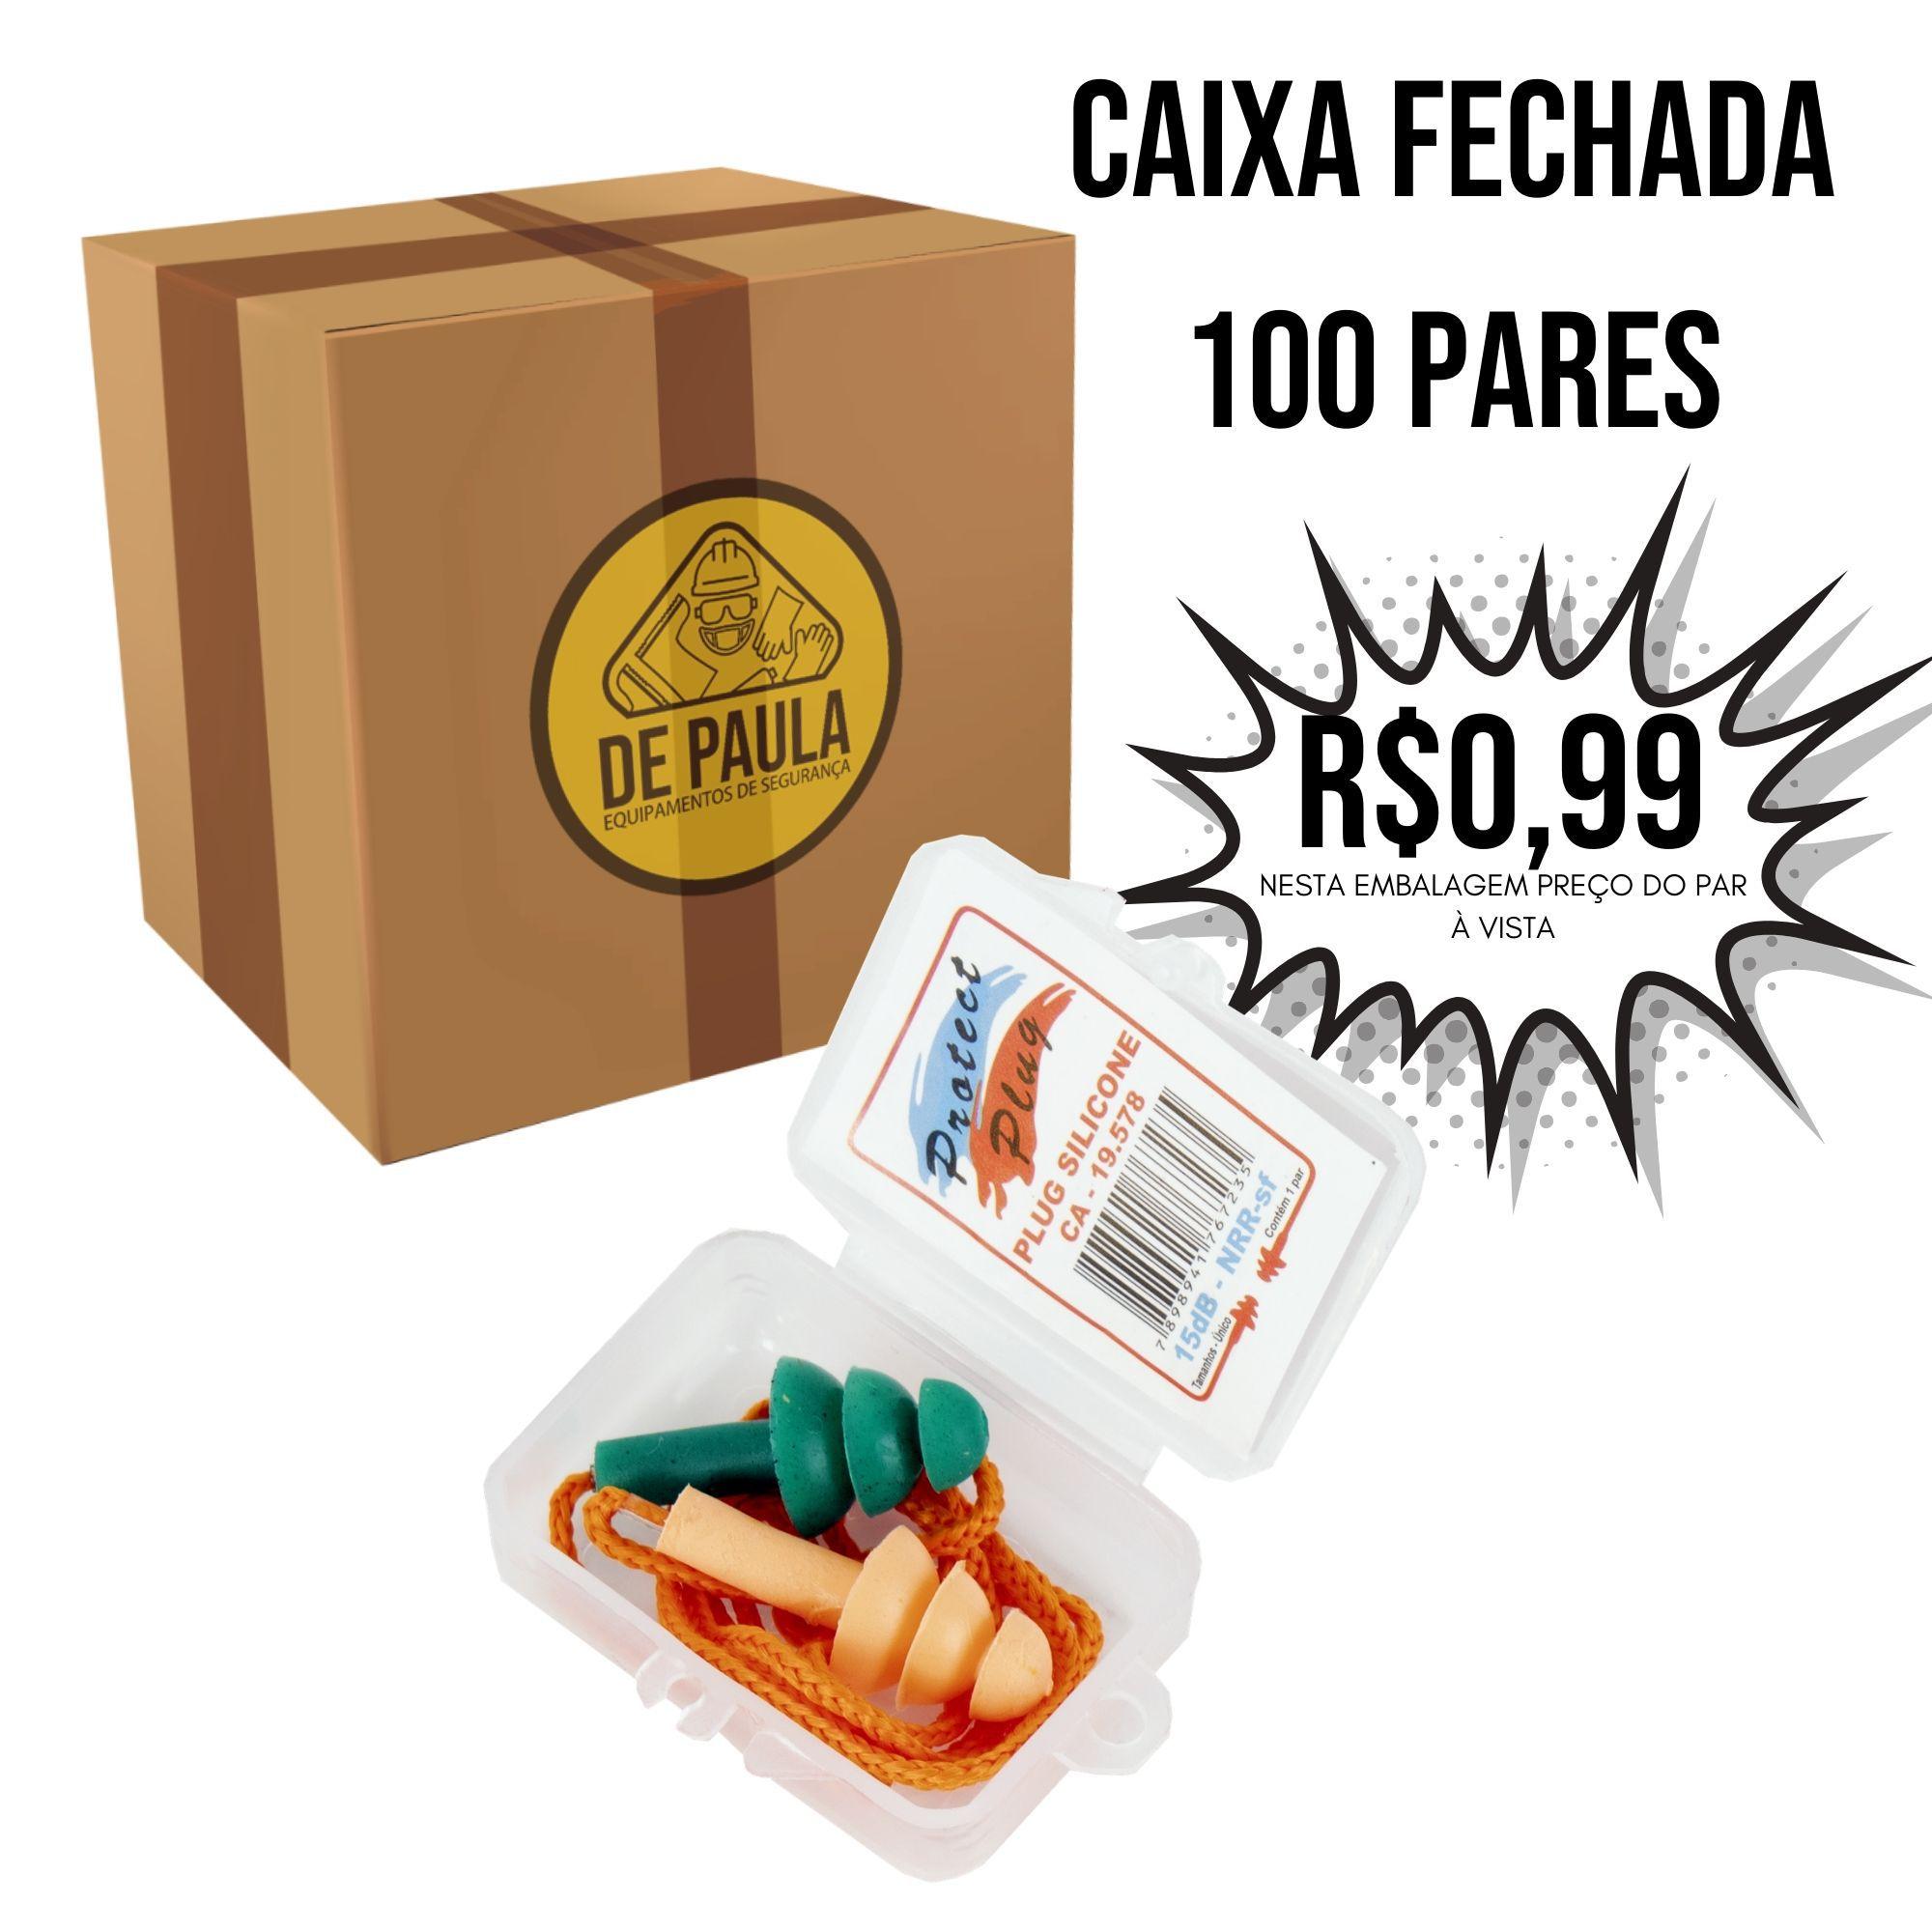 Protetor Auricular Silicone Bicolor Laranja e verde  15db CAIXA FECHADA 100 und  - DE PAULA EPI